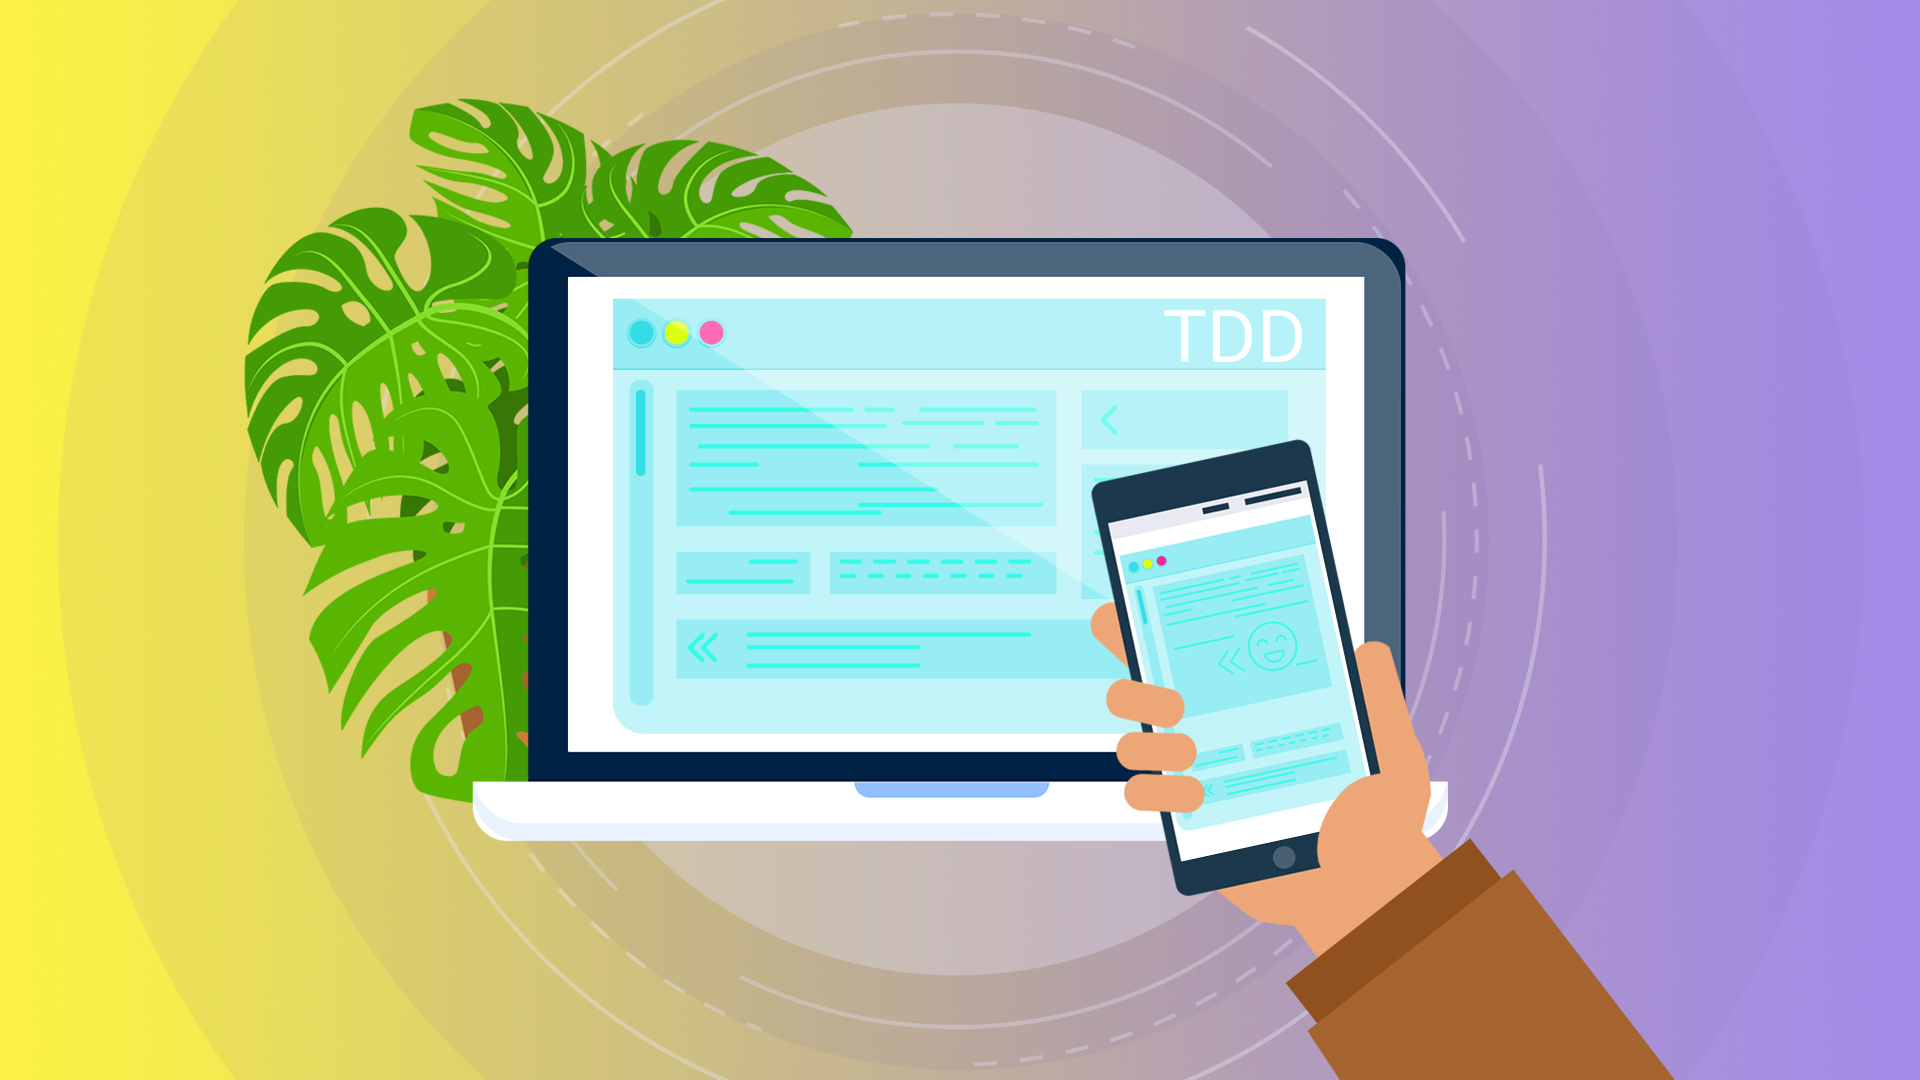 Вебинар Тестирование web-приложений. TDD и Unit-тестирование на PHP фото